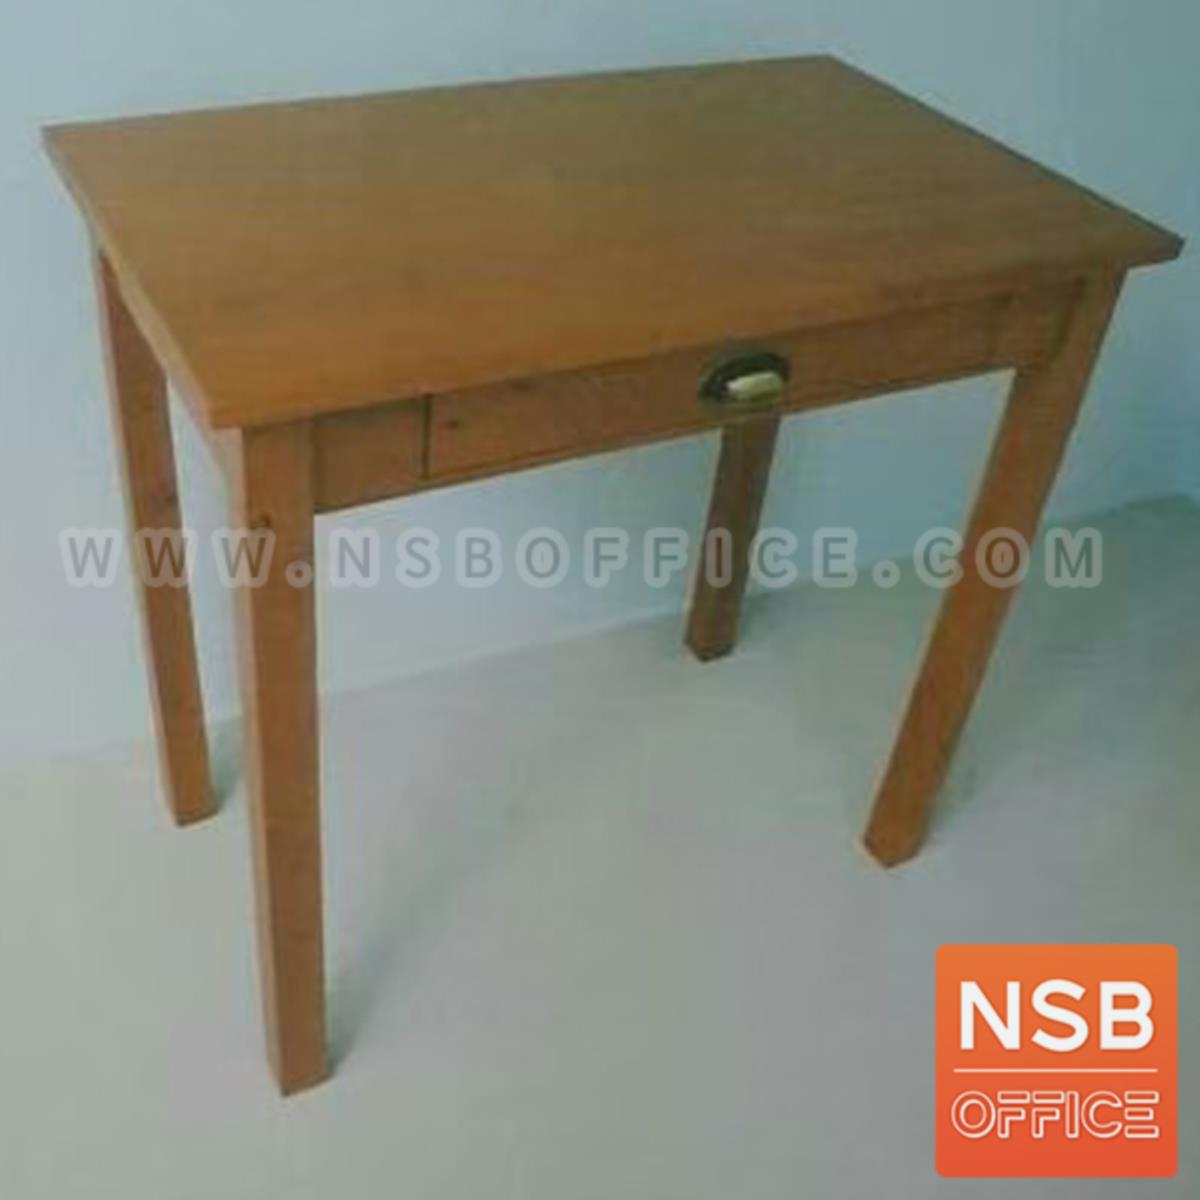 G20A018:โต๊ะเหลี่ยมไม้ยางพารา 1 ลิ้นชัก รุ่น Dariel (เดเรียล) ขนาด 80W*48*75H cm.